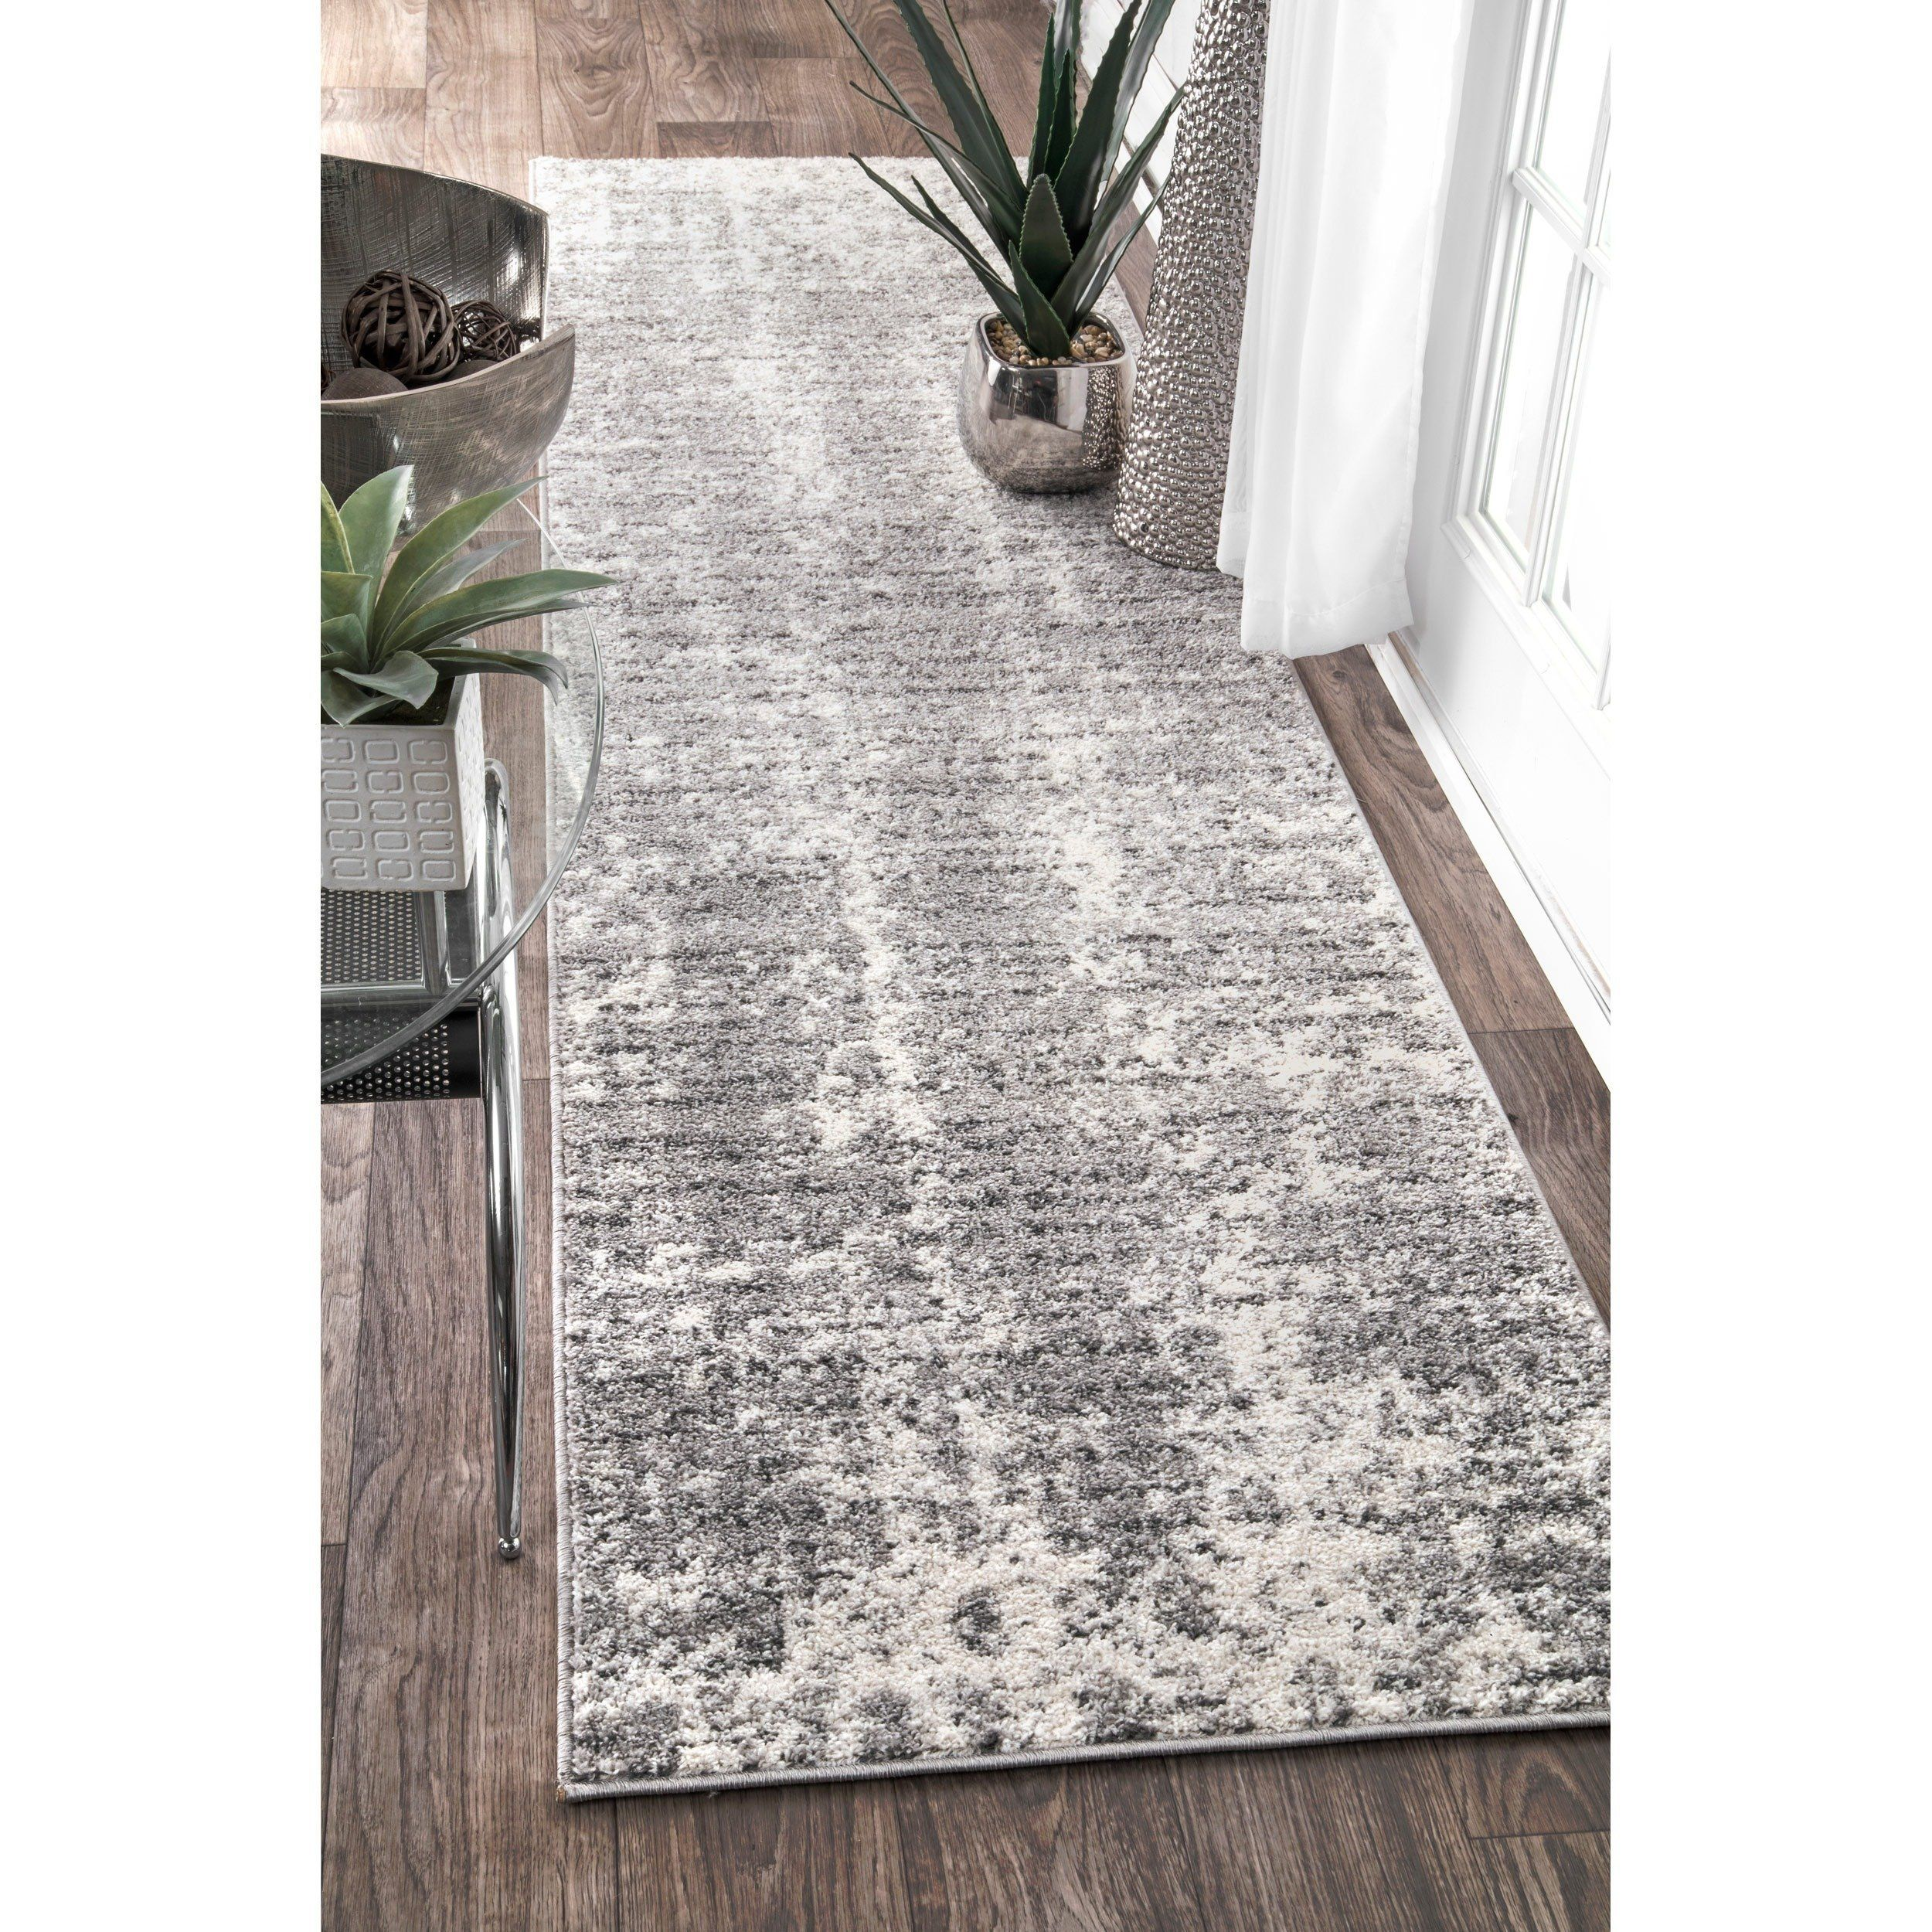 Cream Grey Ivory Living Room Rugs Brown Faded Design Hallway Carpet Runners Rugs